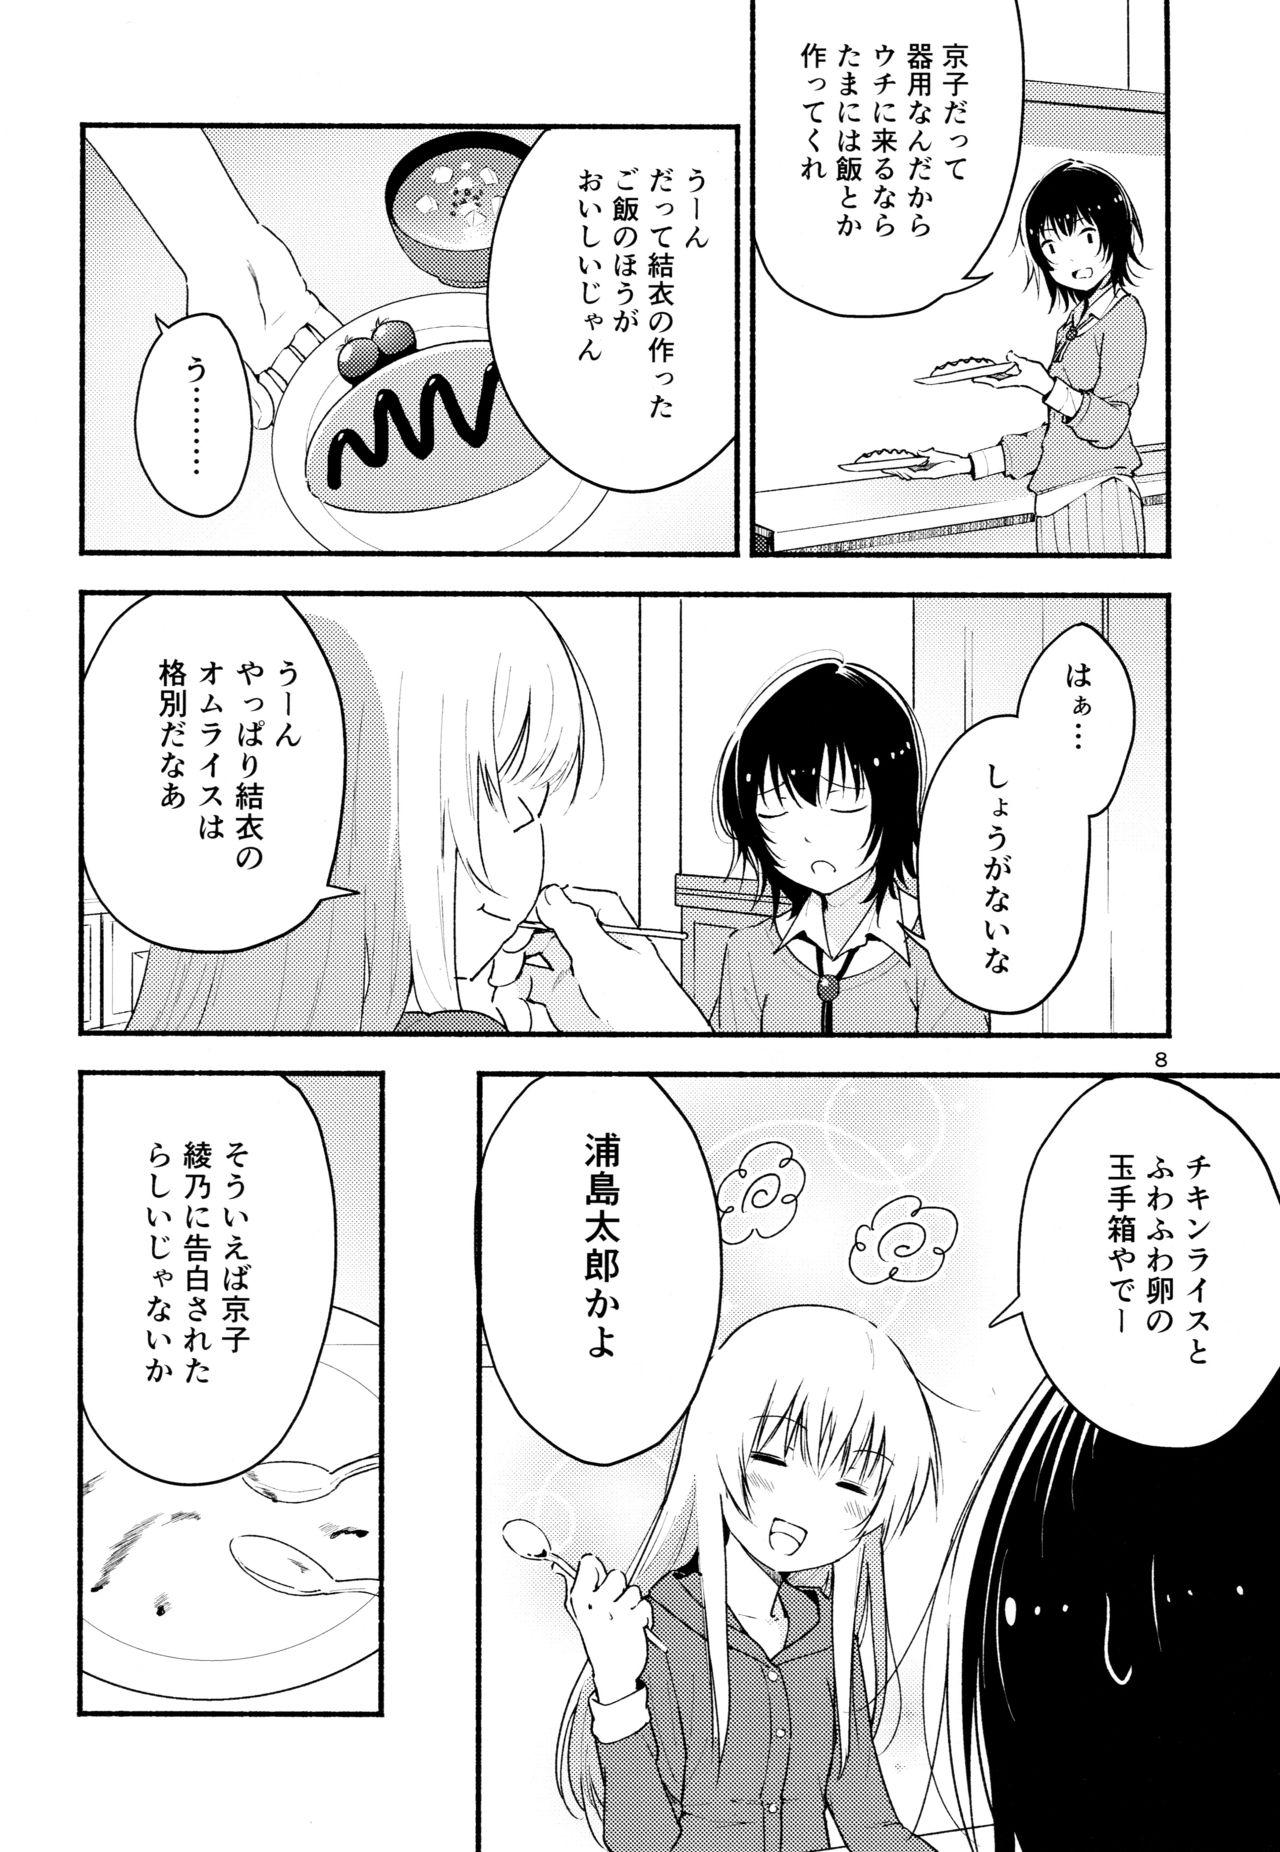 (Girls Love Festival 16) [G-complex (YUI_7)] Kyou mo Ashita mo Yurui Hibi o - Yui and Kyoko and forever loose day-to-day (YuruYuri) 6